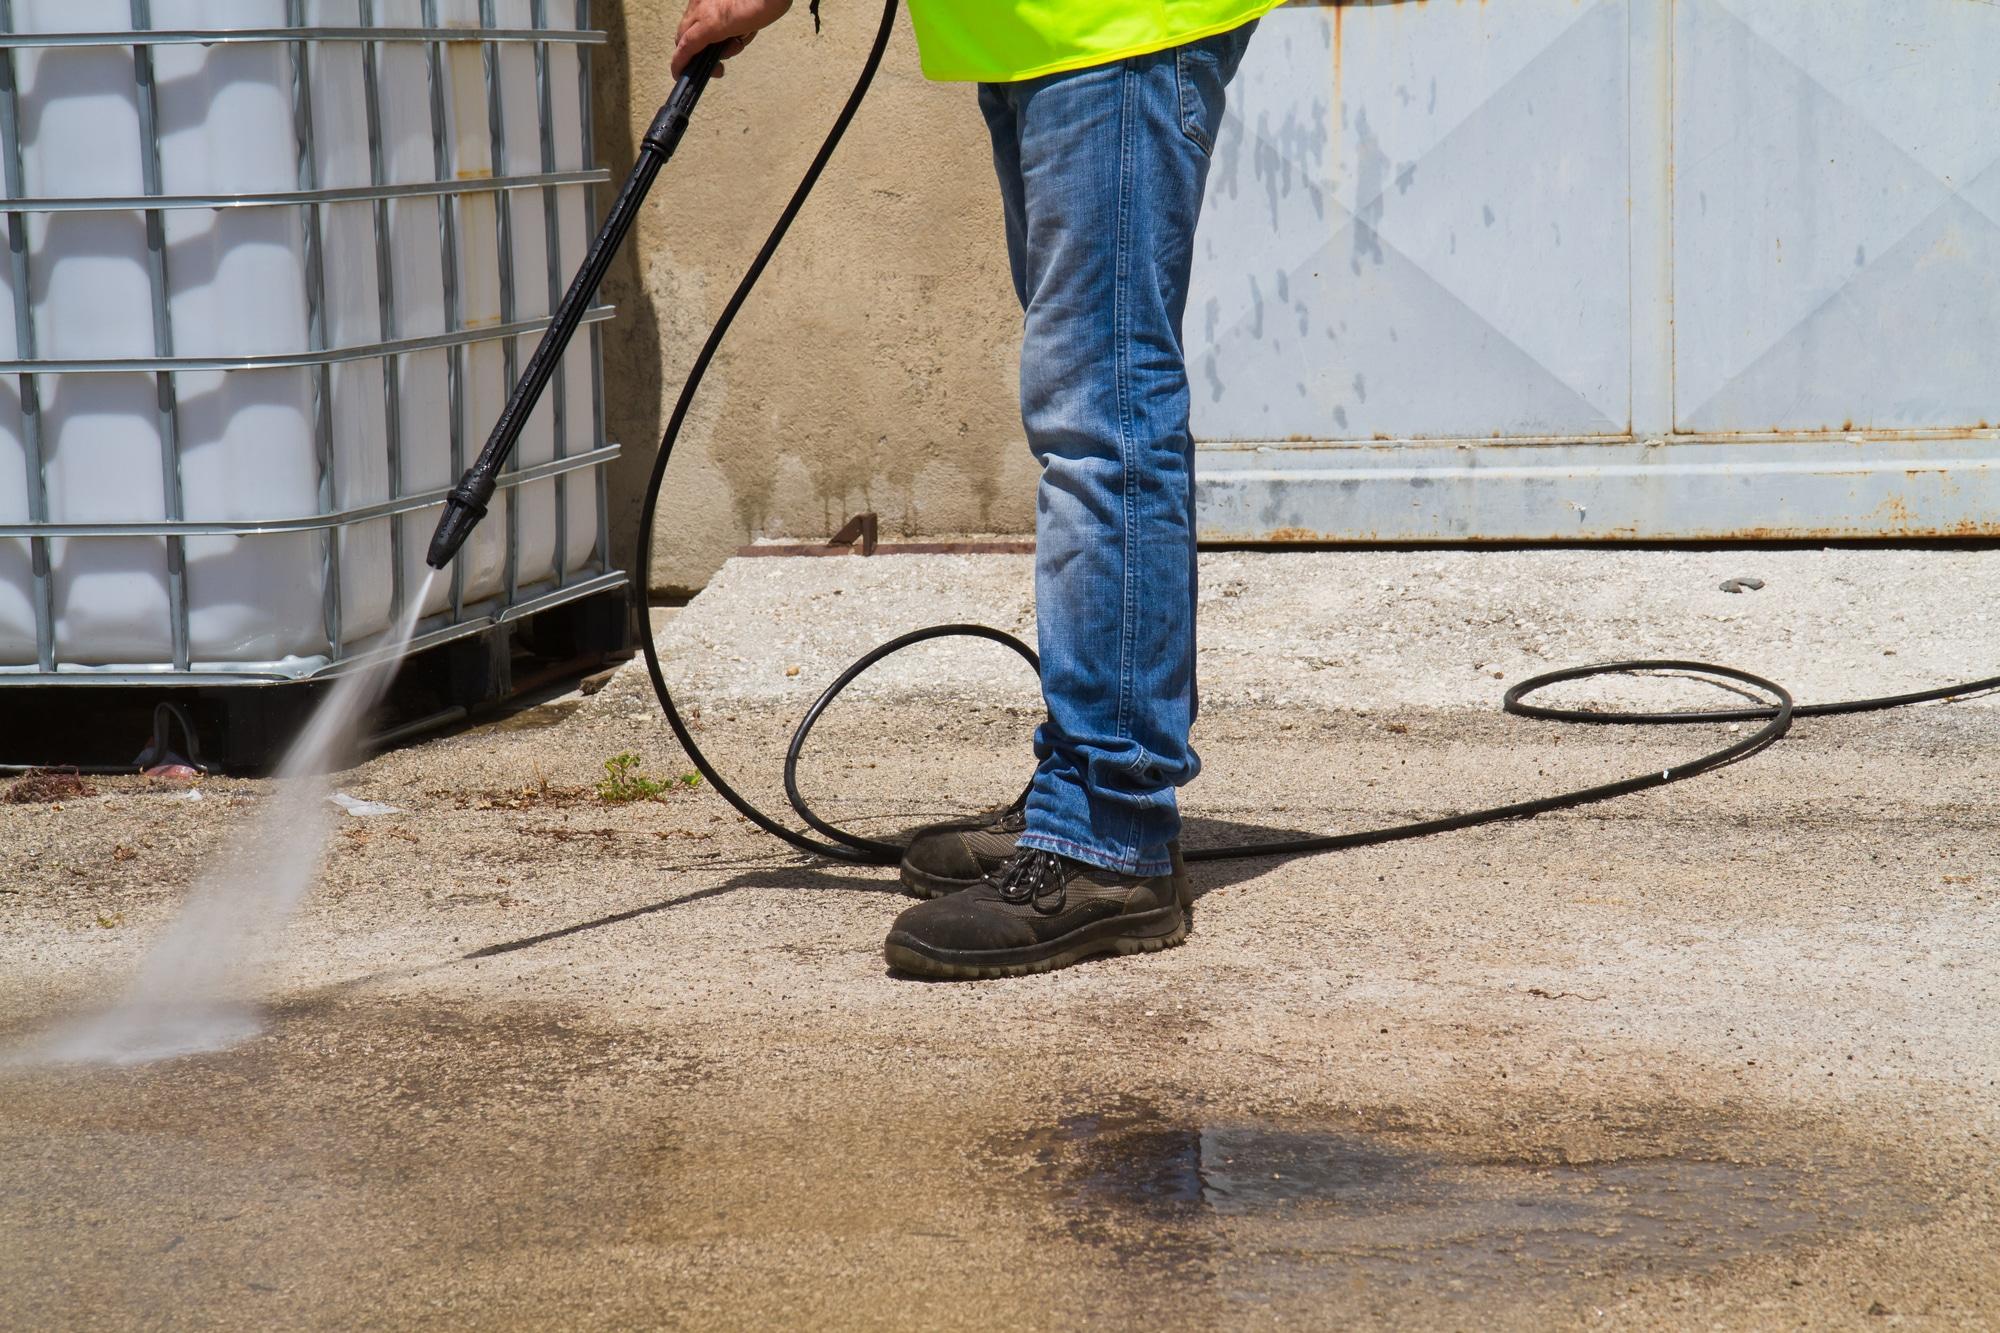 can a pressure washer damage concrete